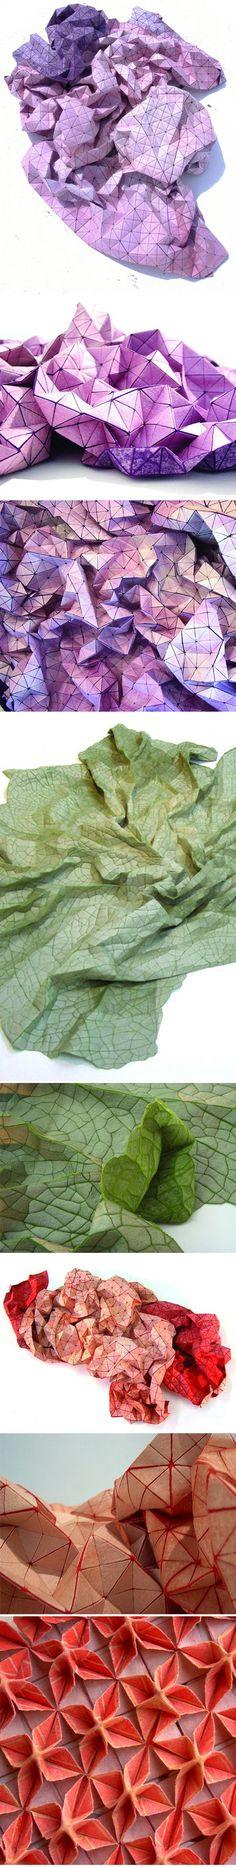 annsunwoo Memory of Skin (CAA) paper, 2013 Paper Art - bambus mobel design siam kollektion sicis bilder